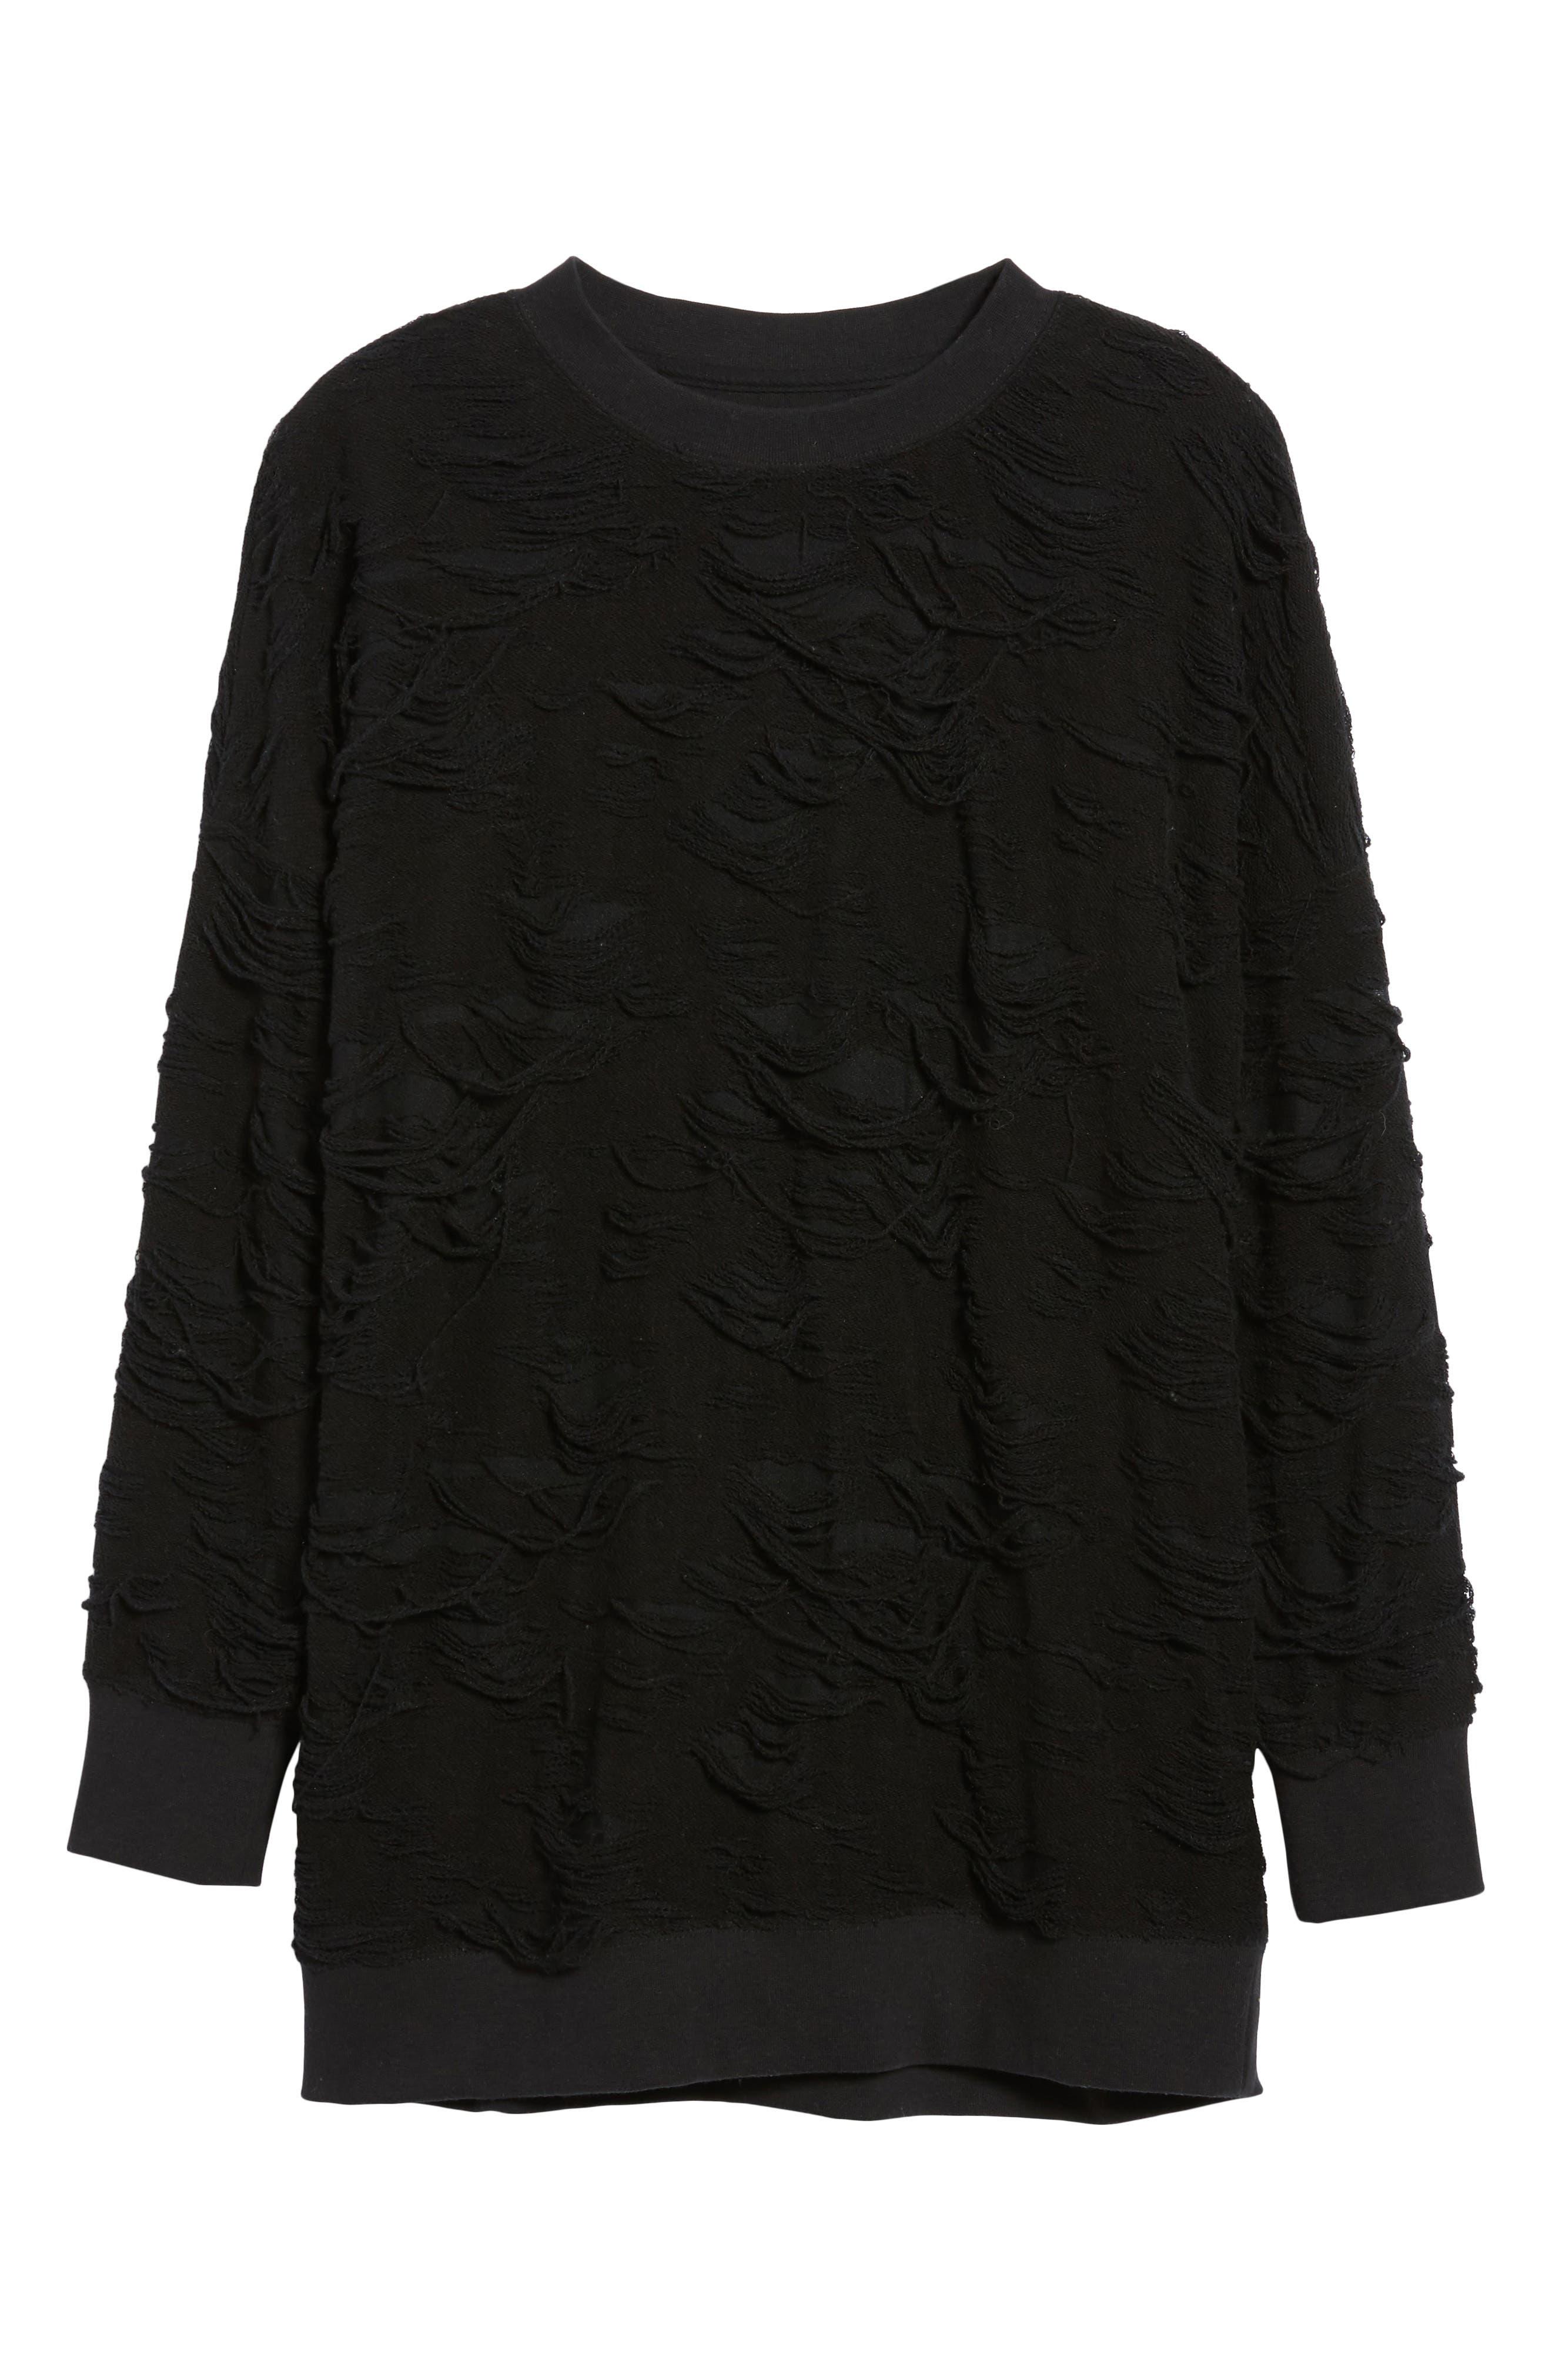 Me Too Slashed Sweatshirt,                             Alternate thumbnail 6, color,                             001